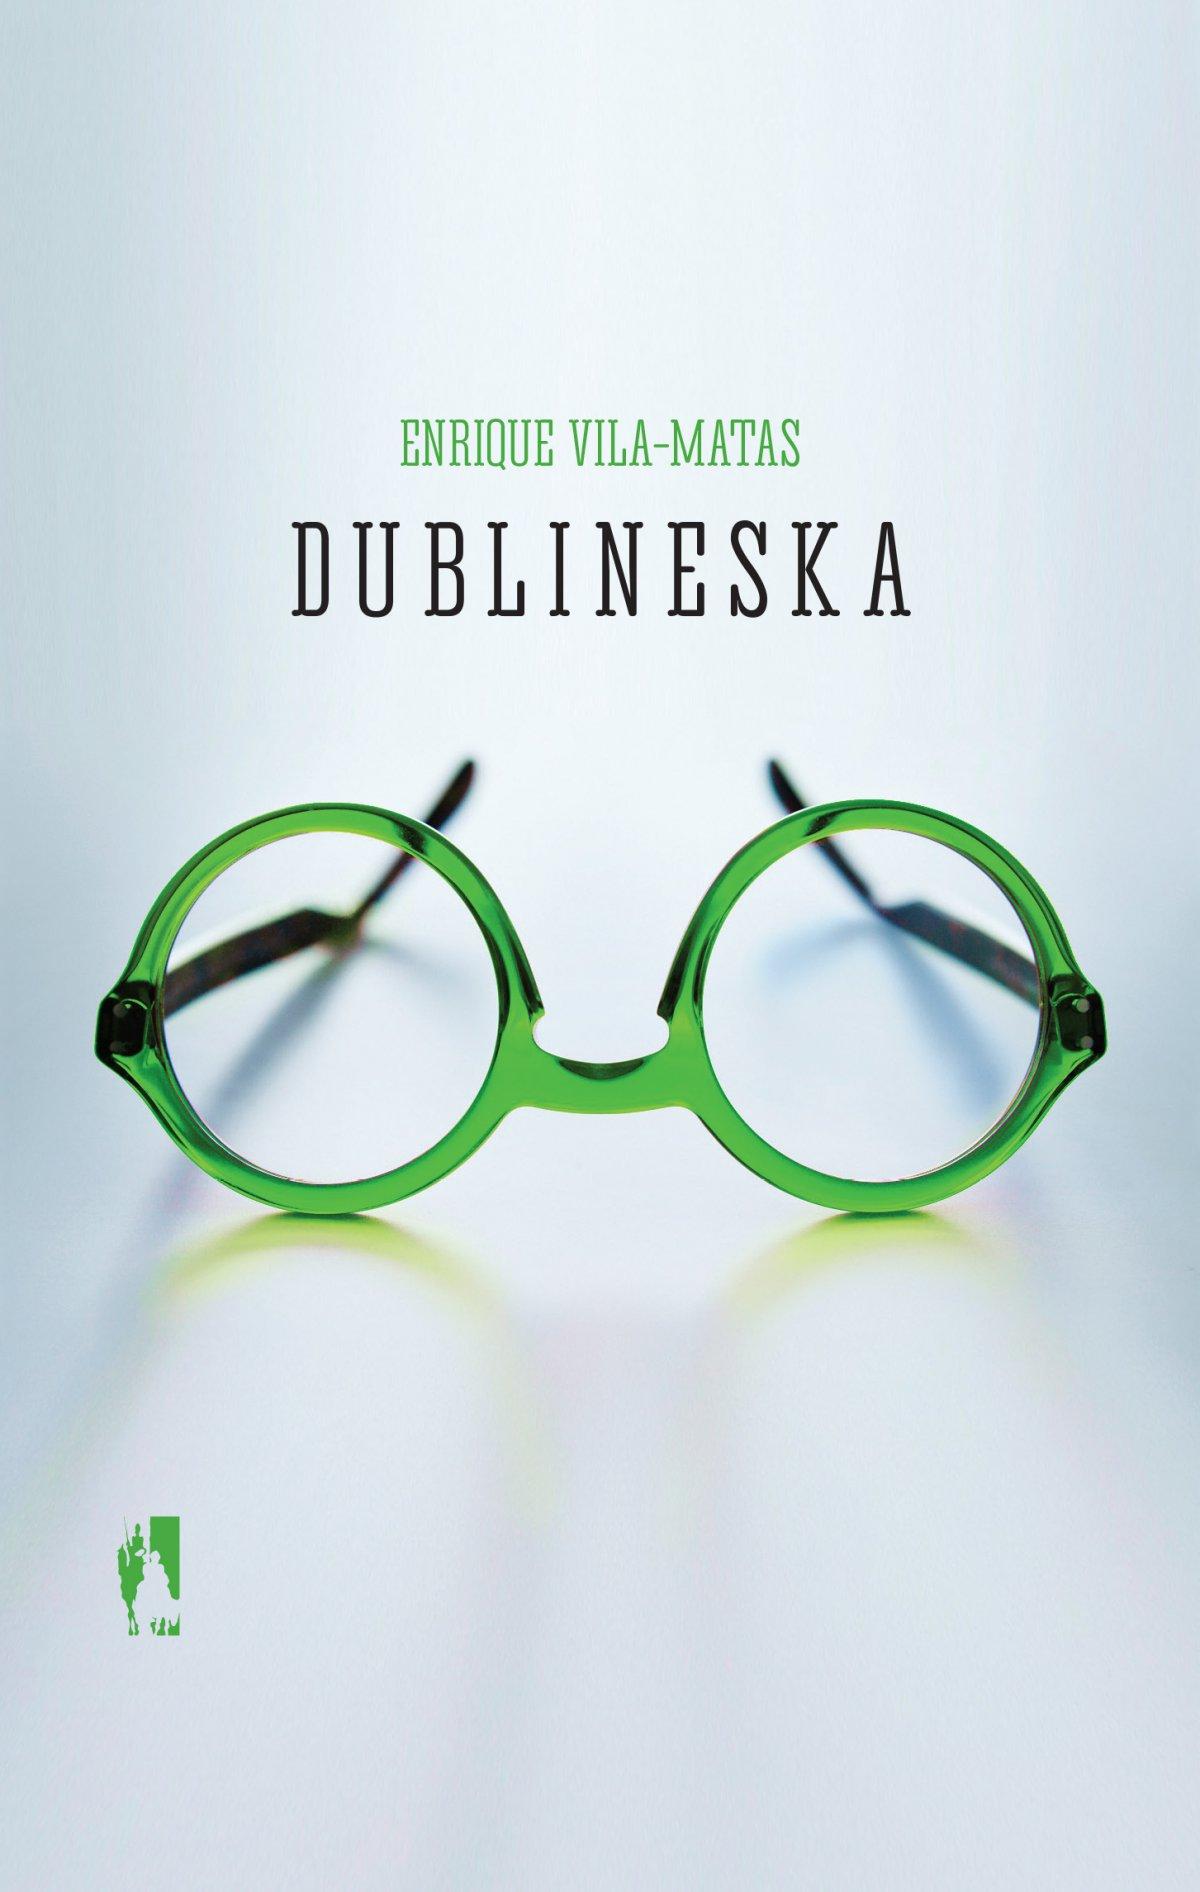 Dublineska - Ebook (Książka na Kindle) do pobrania w formacie MOBI